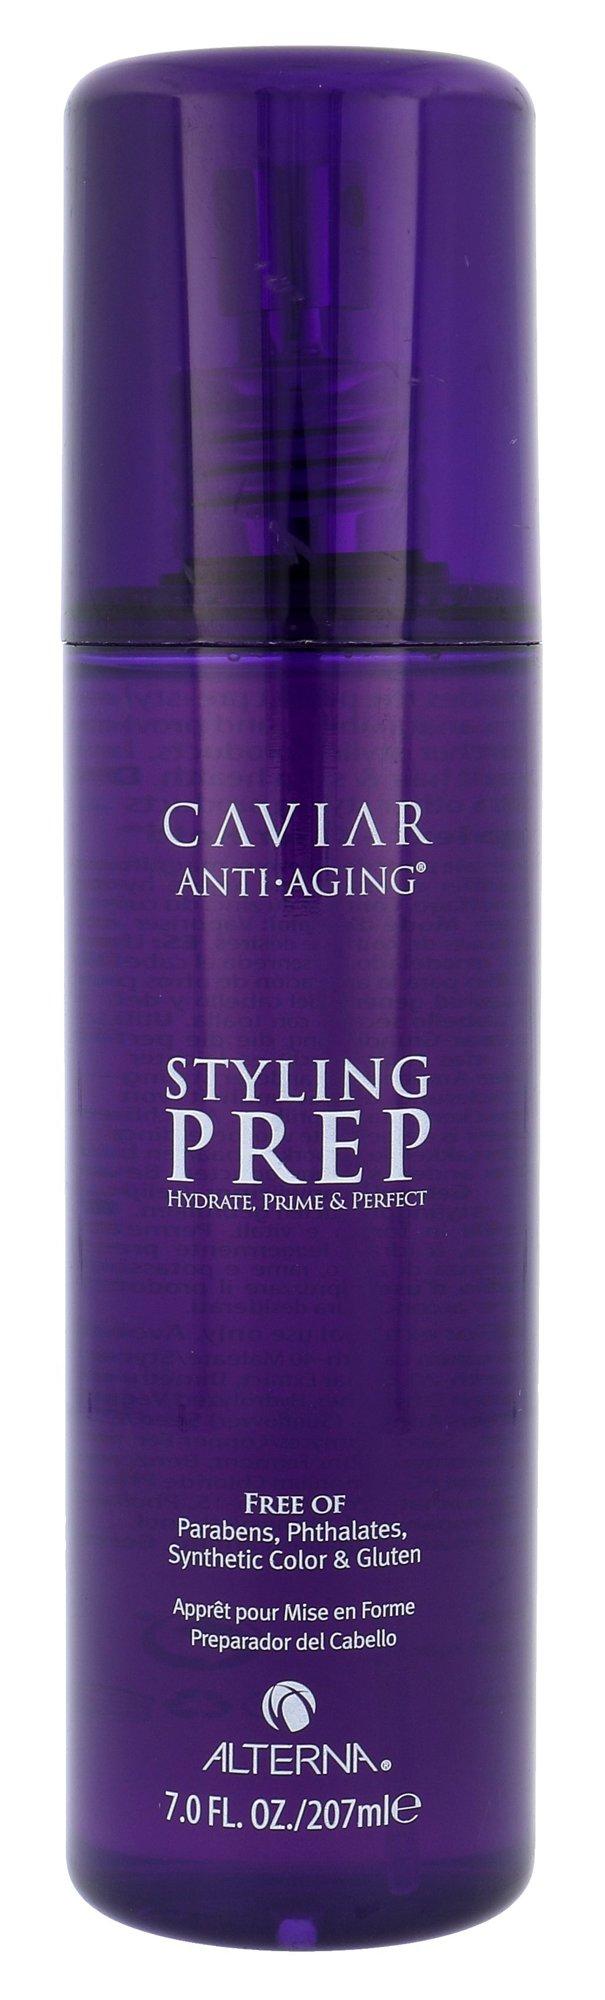 Alterna Caviar Anti-Aging Cosmetic 207ml